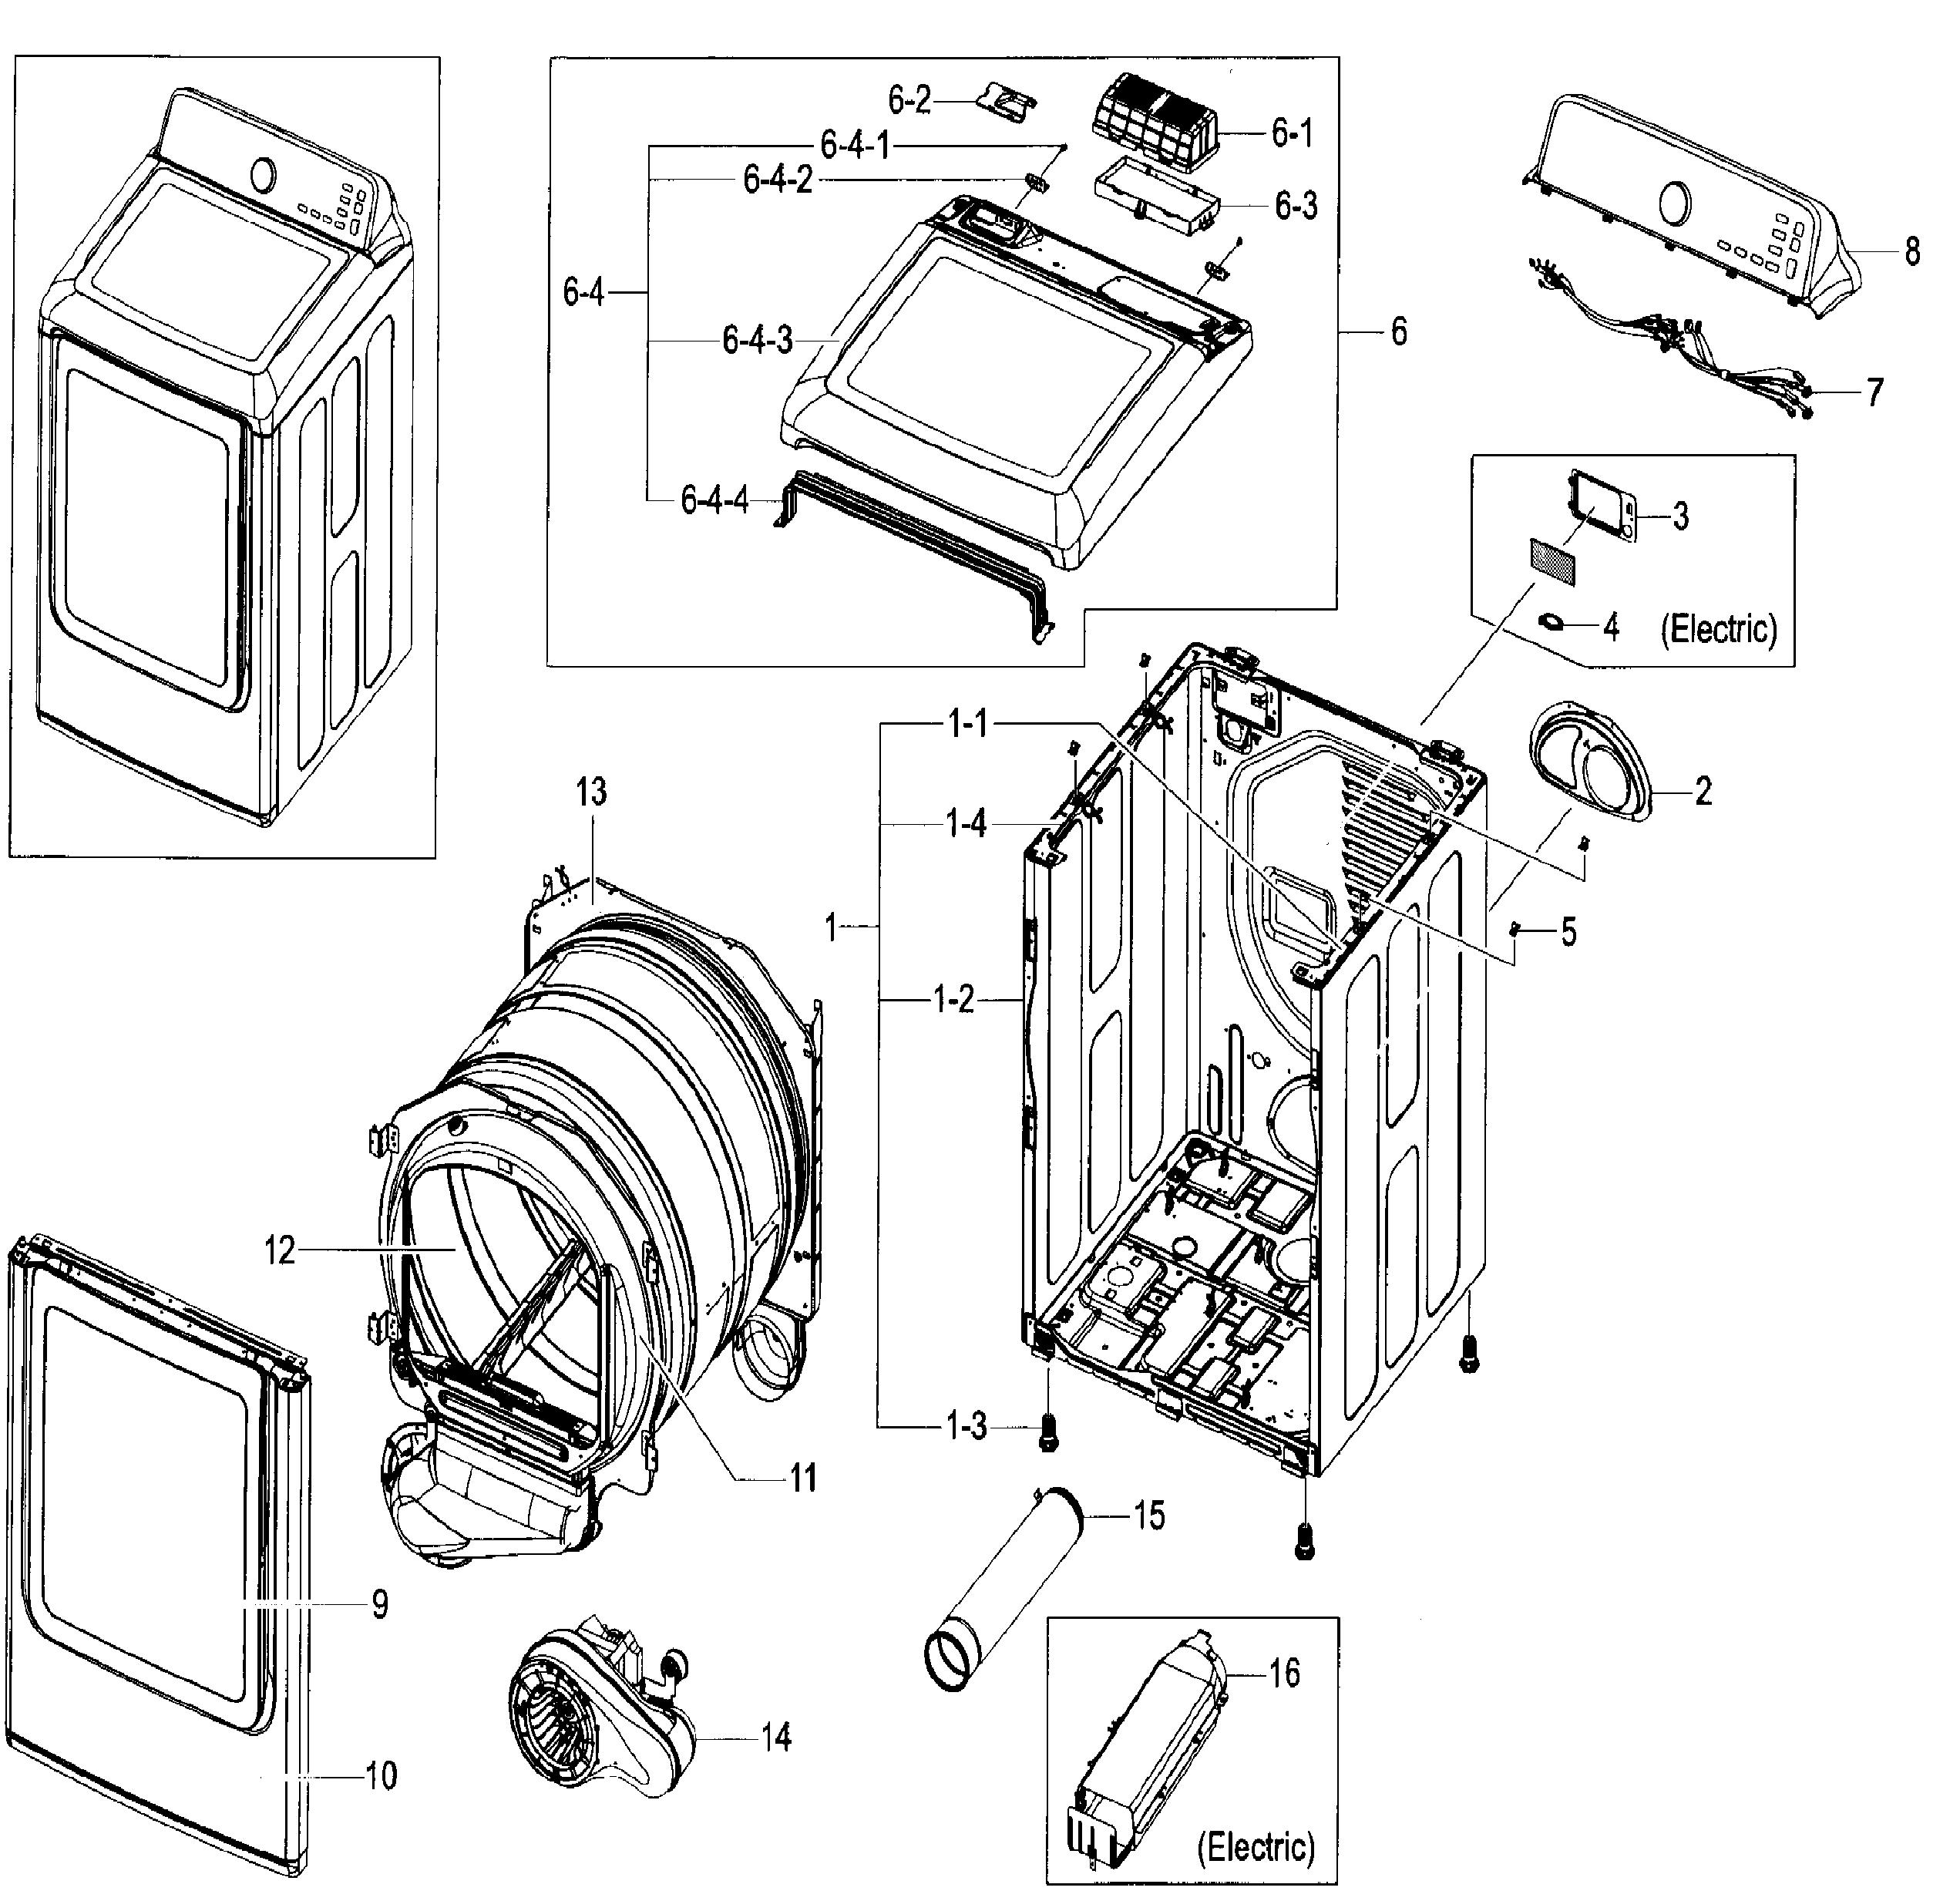 Samsung Dryer Dv45h7000ew Belt Replacement Best 2018 Diagram Dc93 00634a 6602 001655 Idler Pulley Original